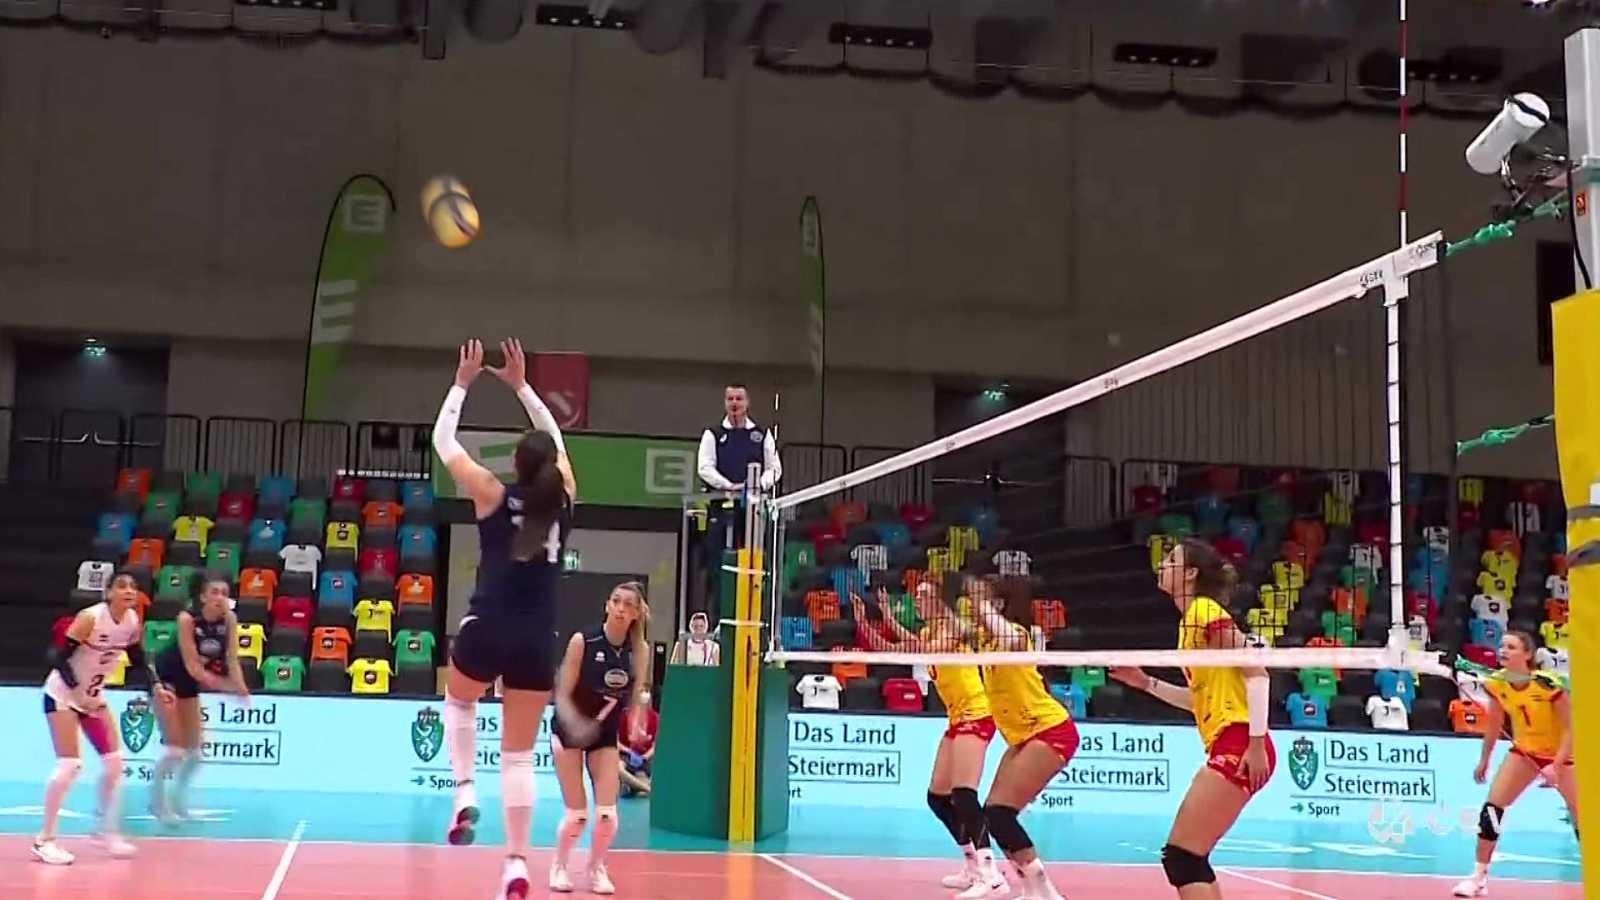 Voleibol - Clasificación Campeonato de Europa femenino 5ª jornada: España - Grecia  - ver ahora